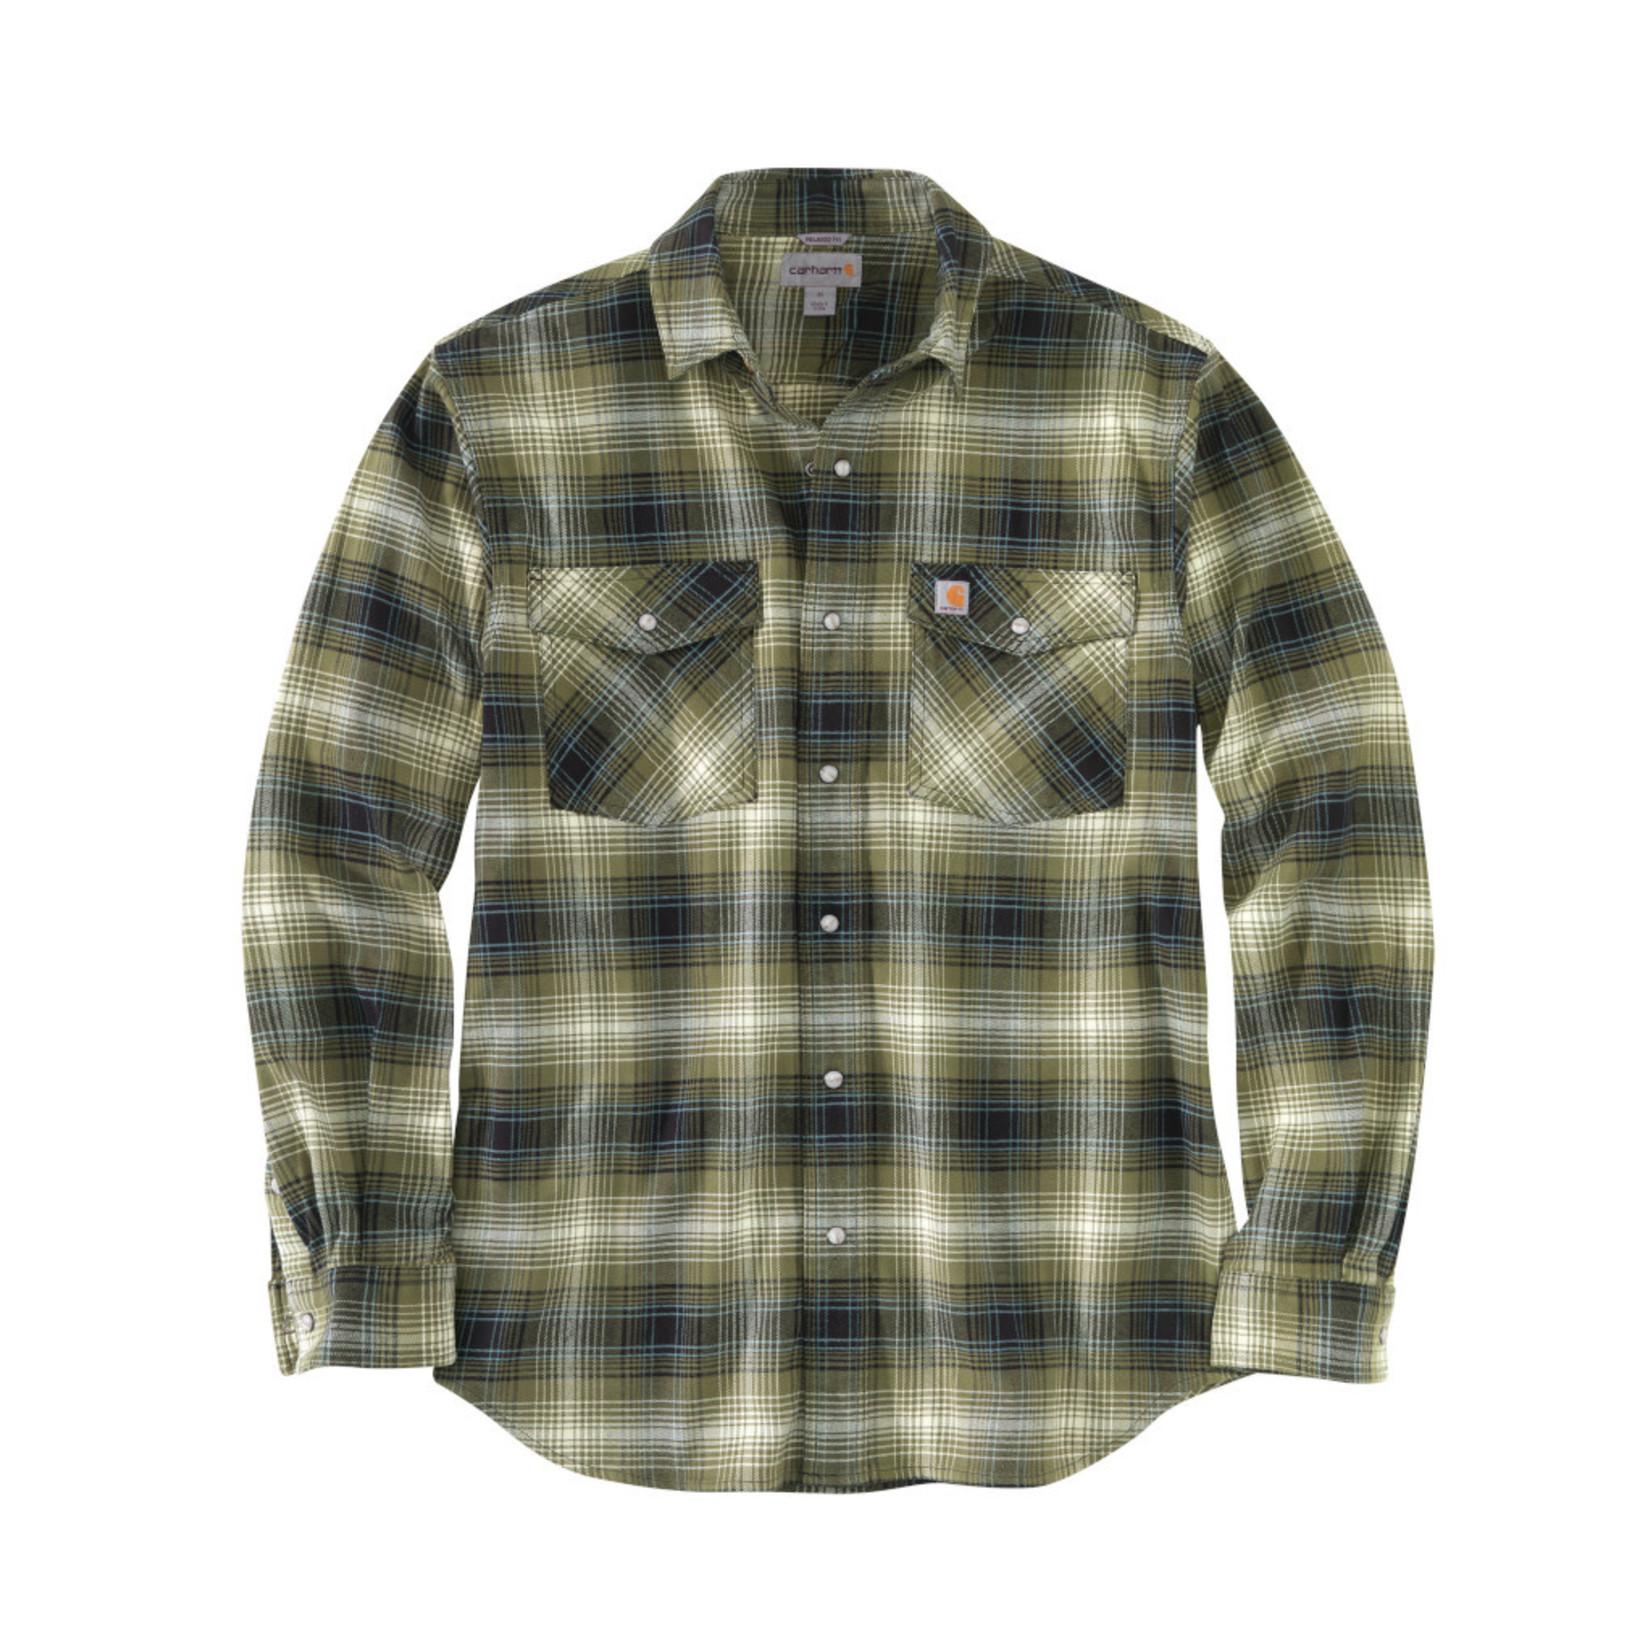 Carhartt Carhartt Rugged Flex Flannel Shirt with Snaps 104449